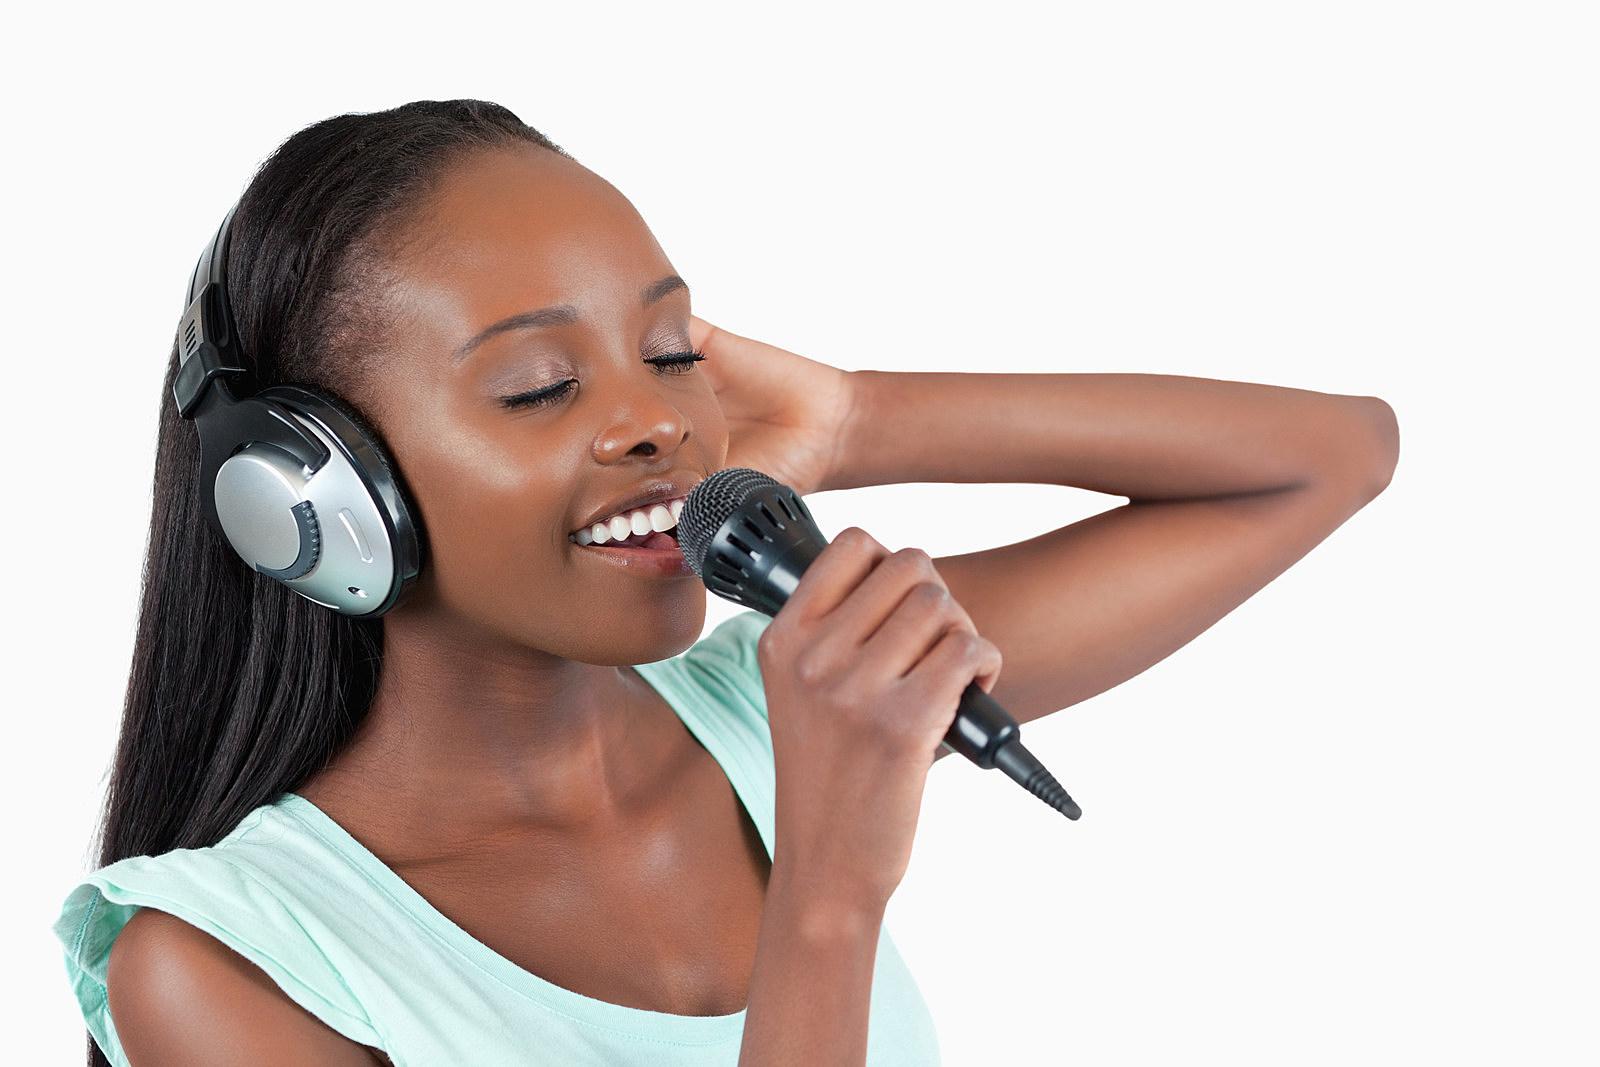 Young woman enjoys singing